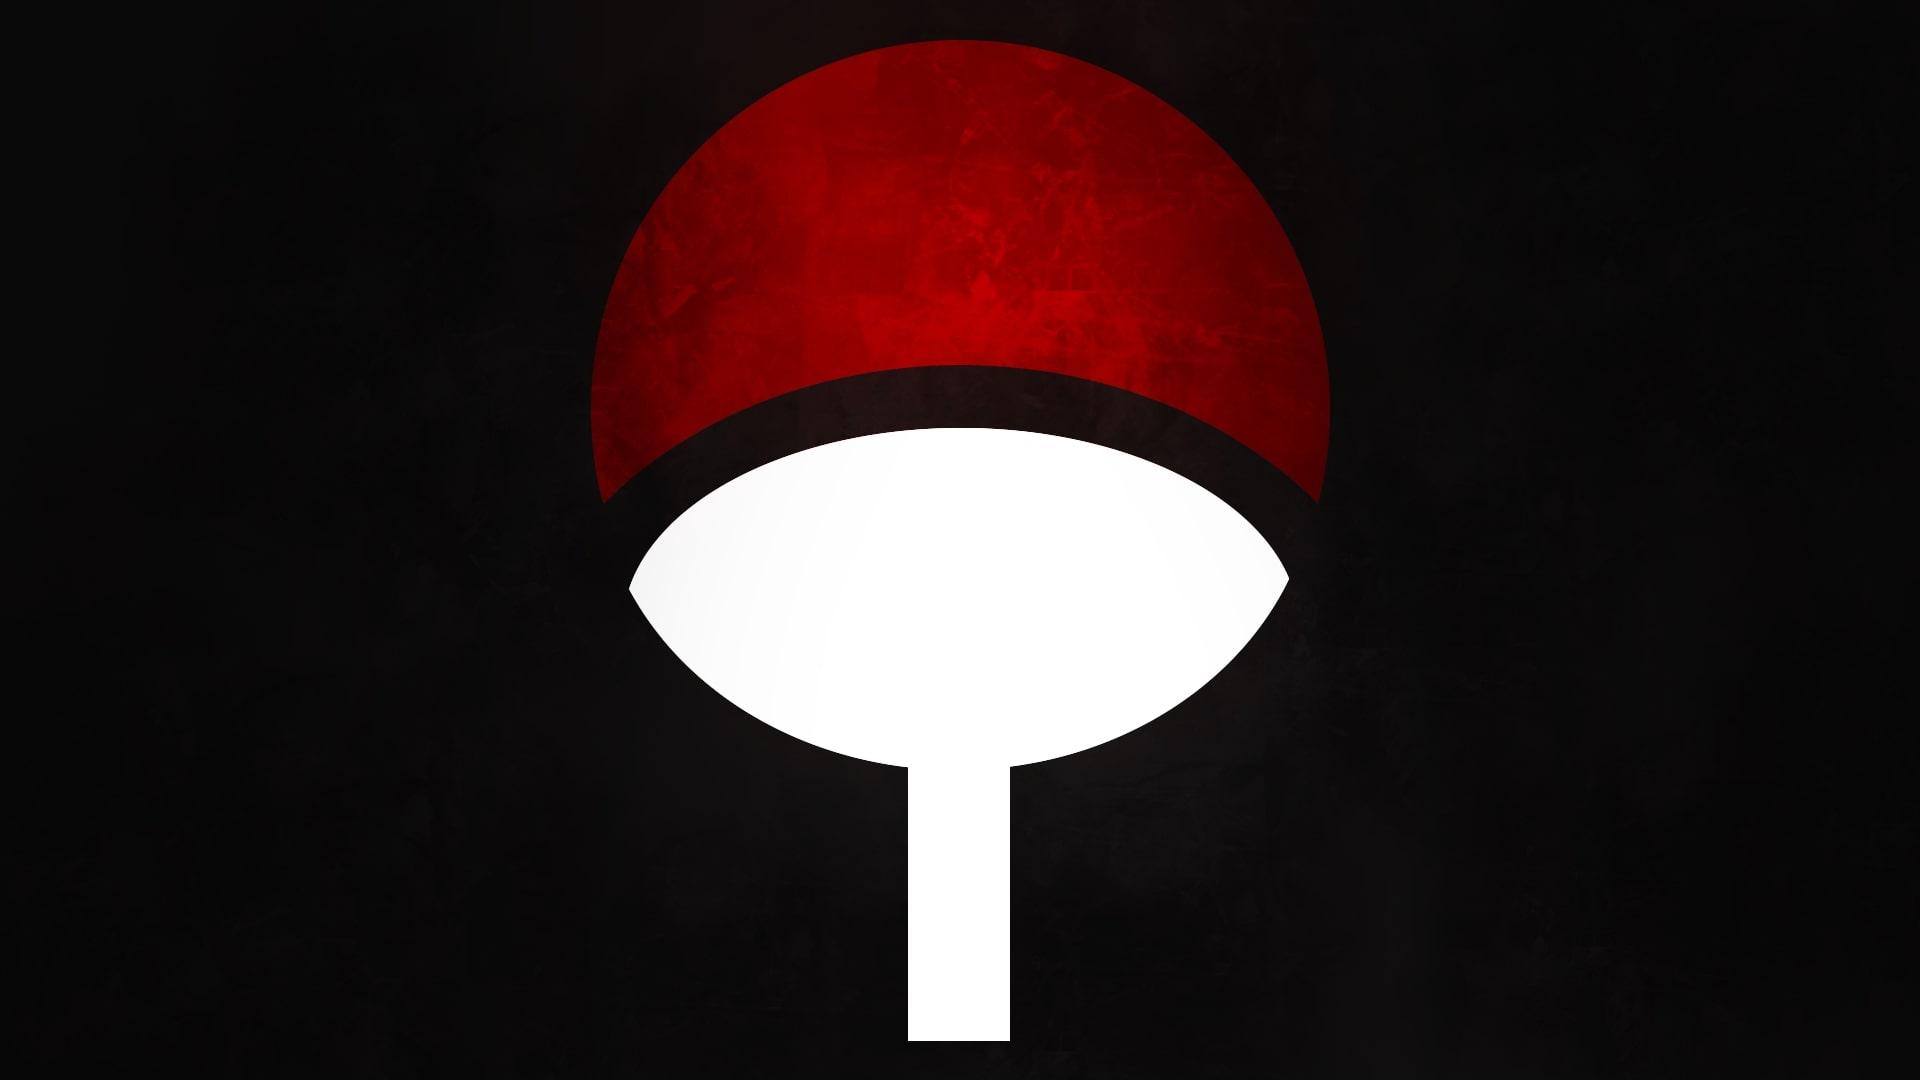 Wallpaper of Naruto, Red, Symbol, Uchiha Clan, White